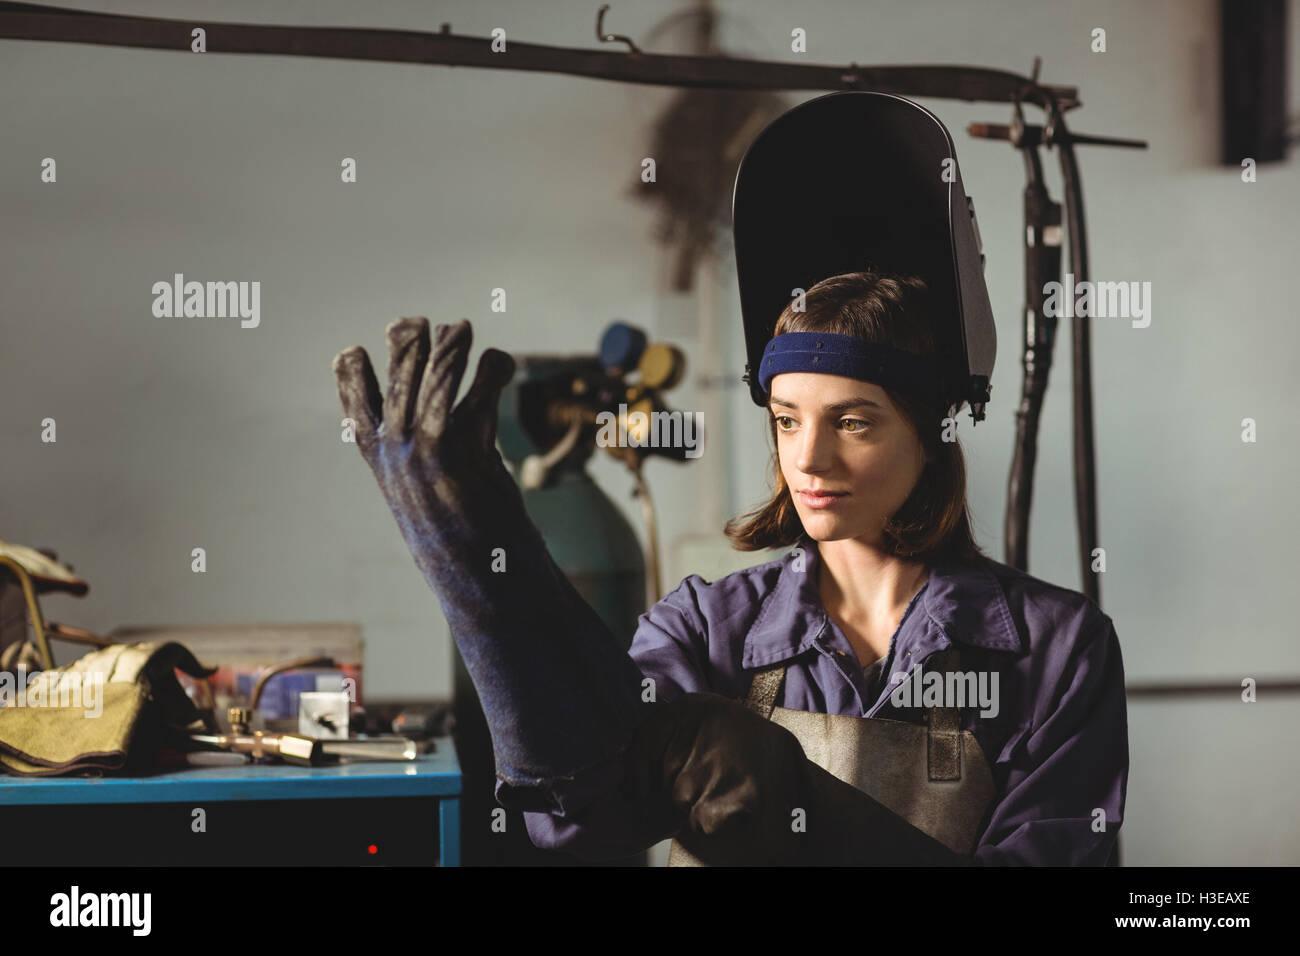 Female welder wearing glove - Stock Image